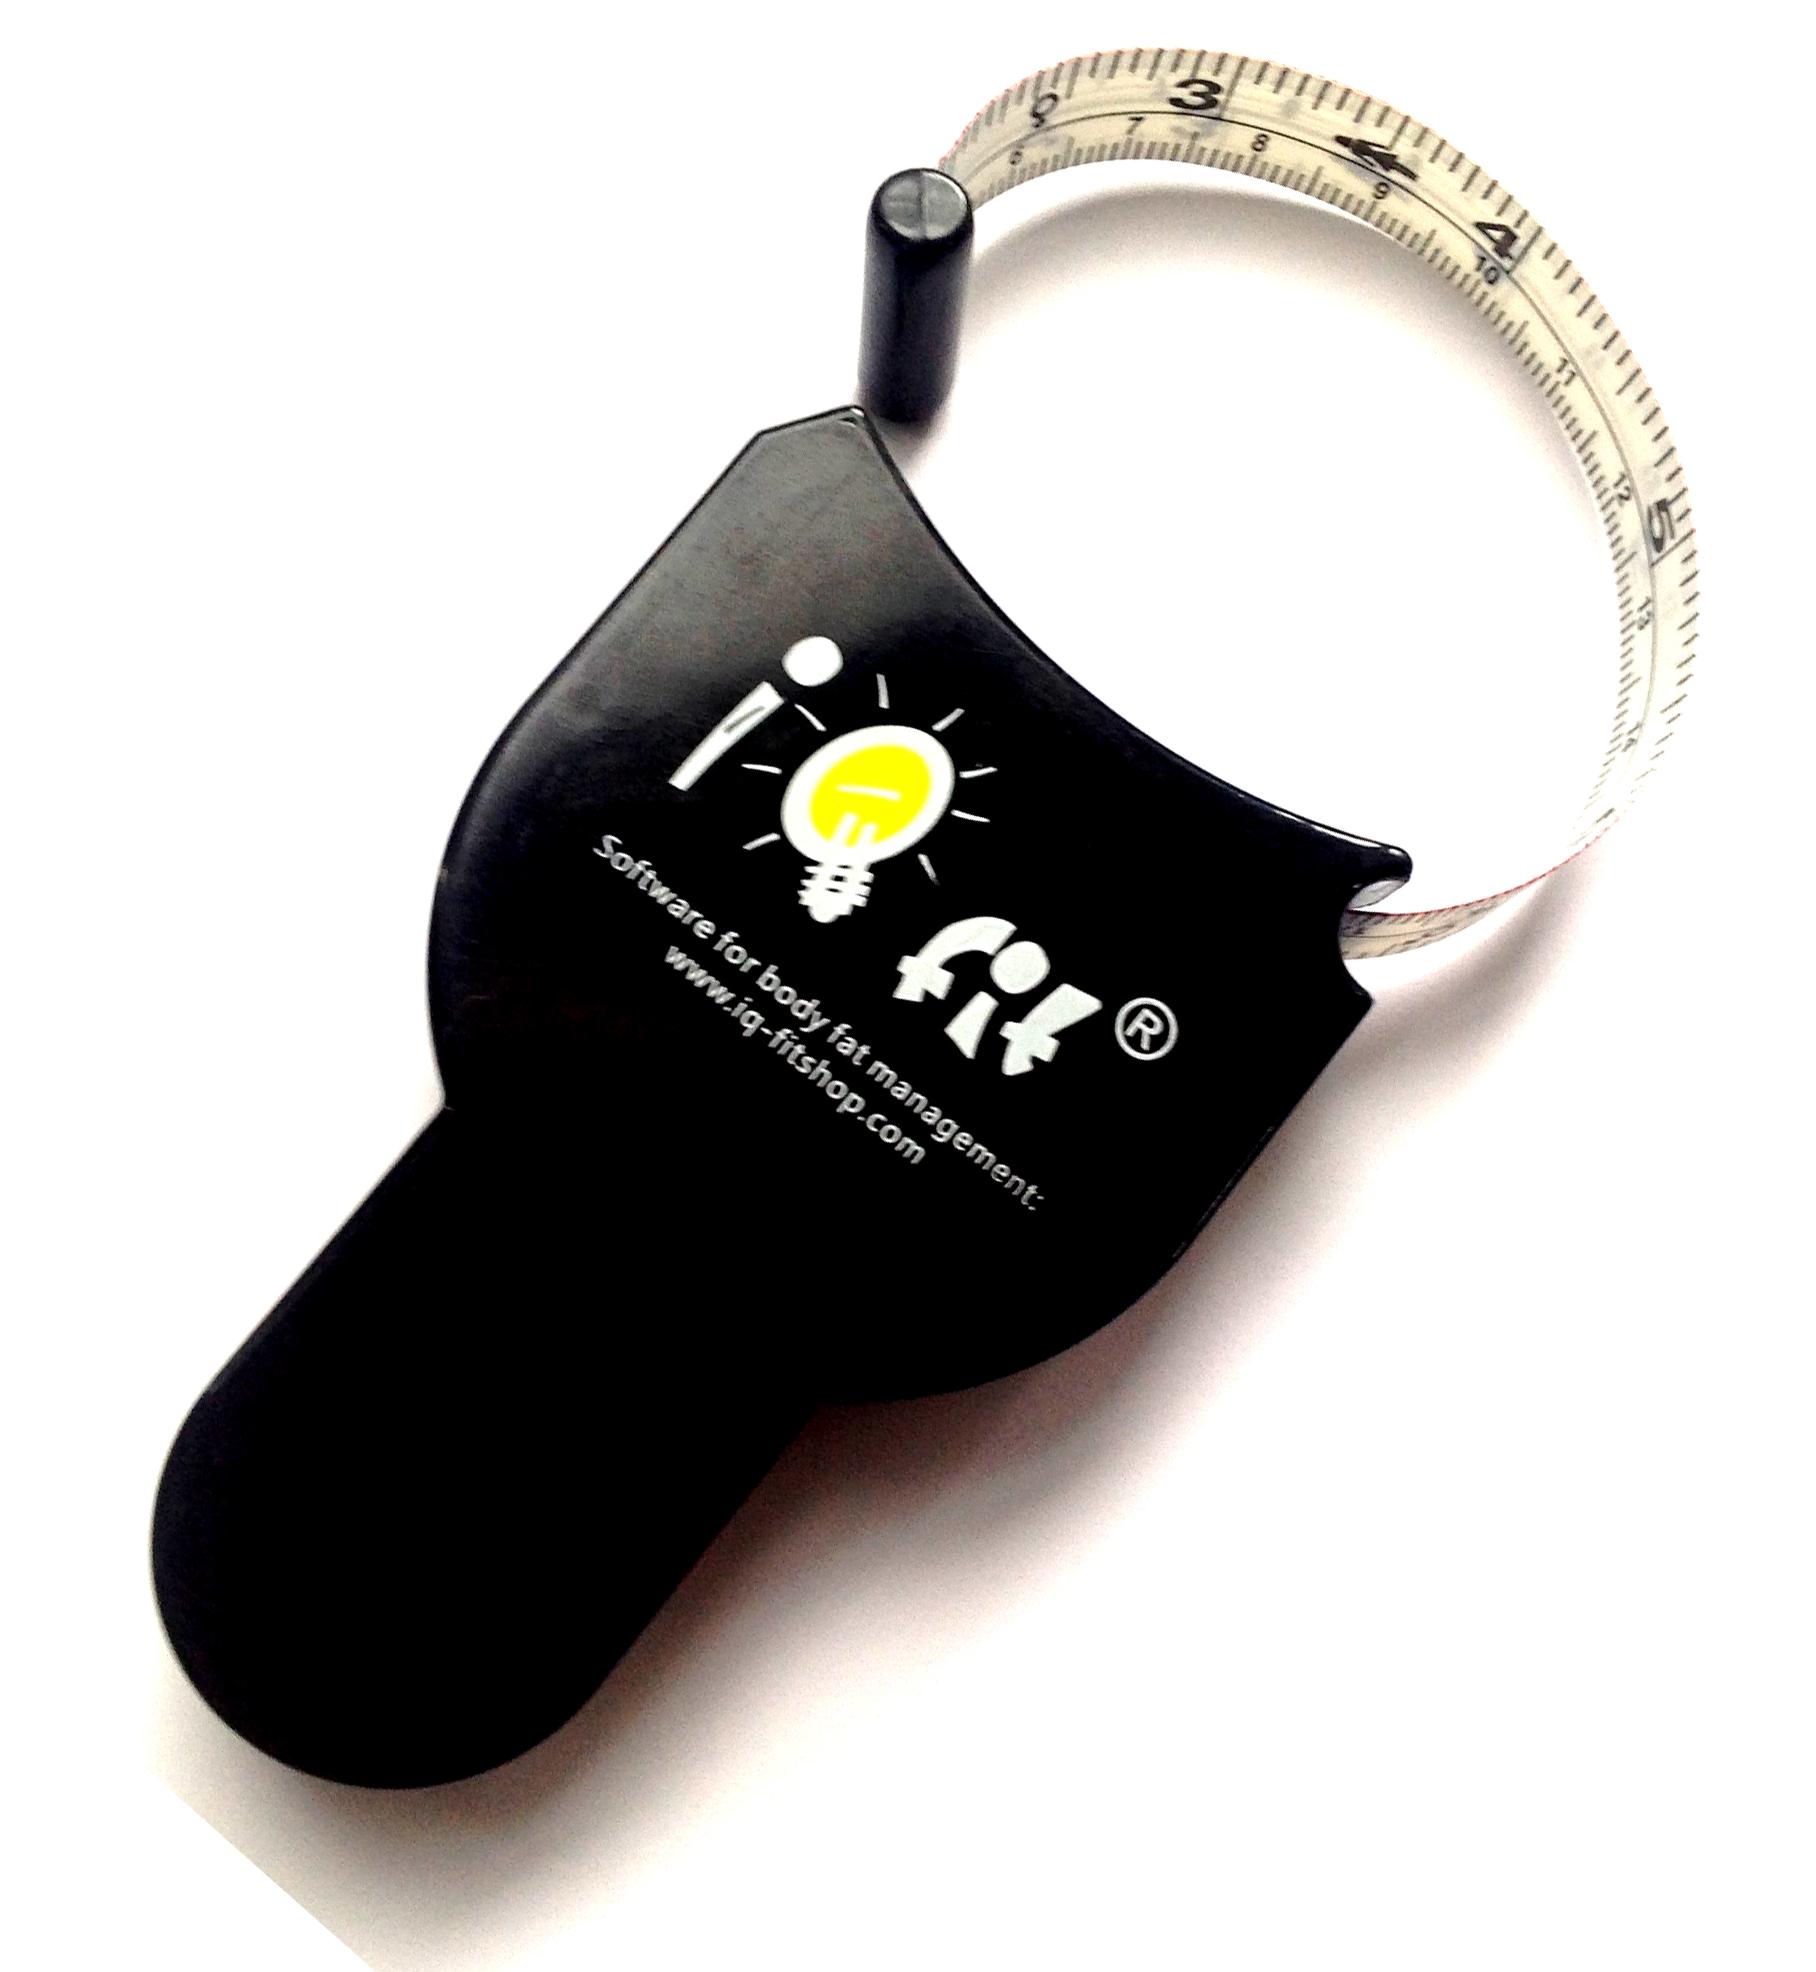 Ergonomisch Körpermassband Umfangsmessband Rollmaßband für Diät